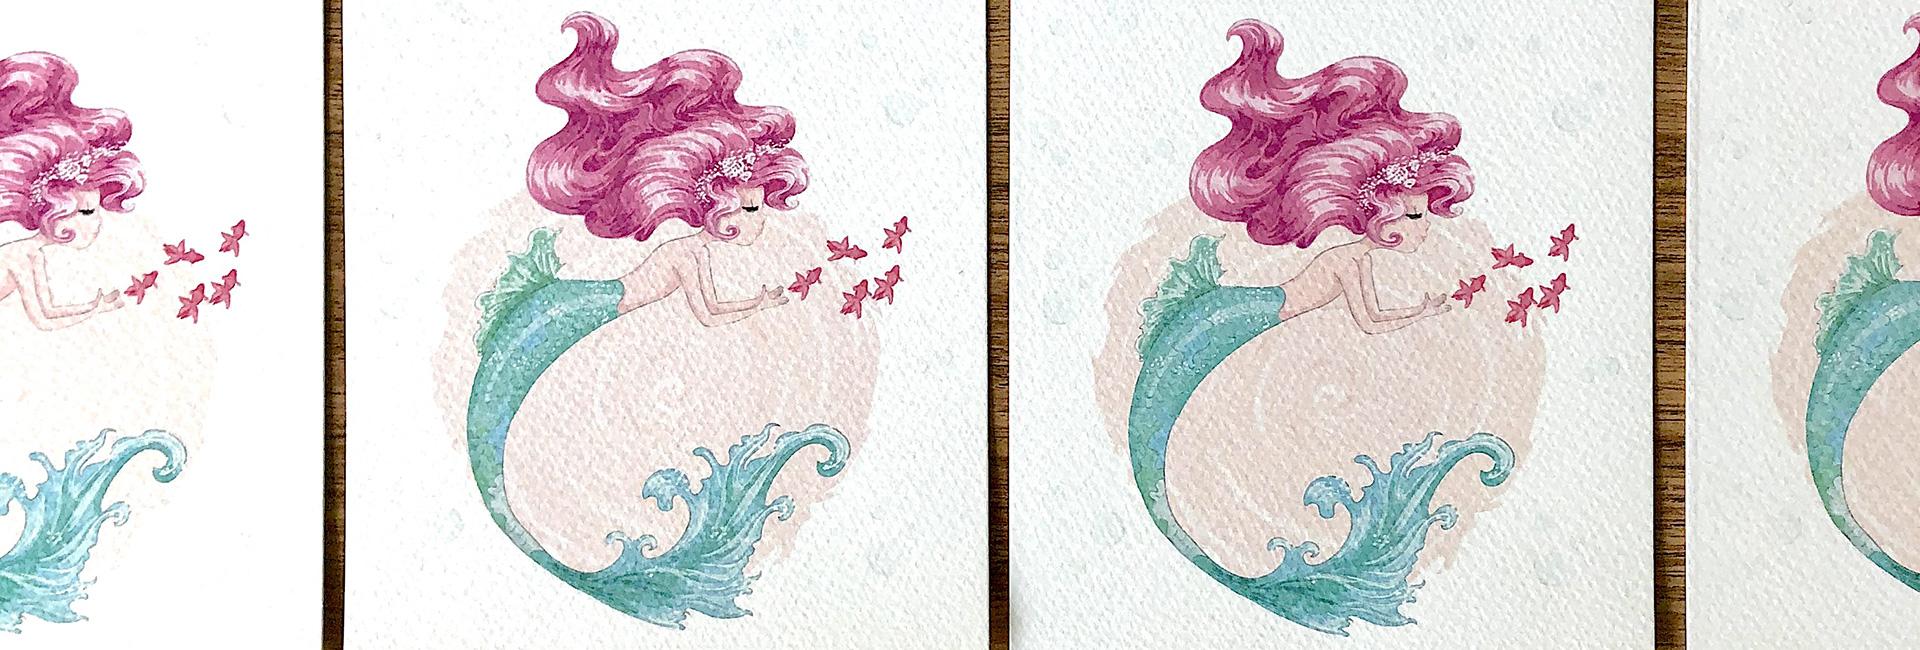 Invito Purple Mermaid